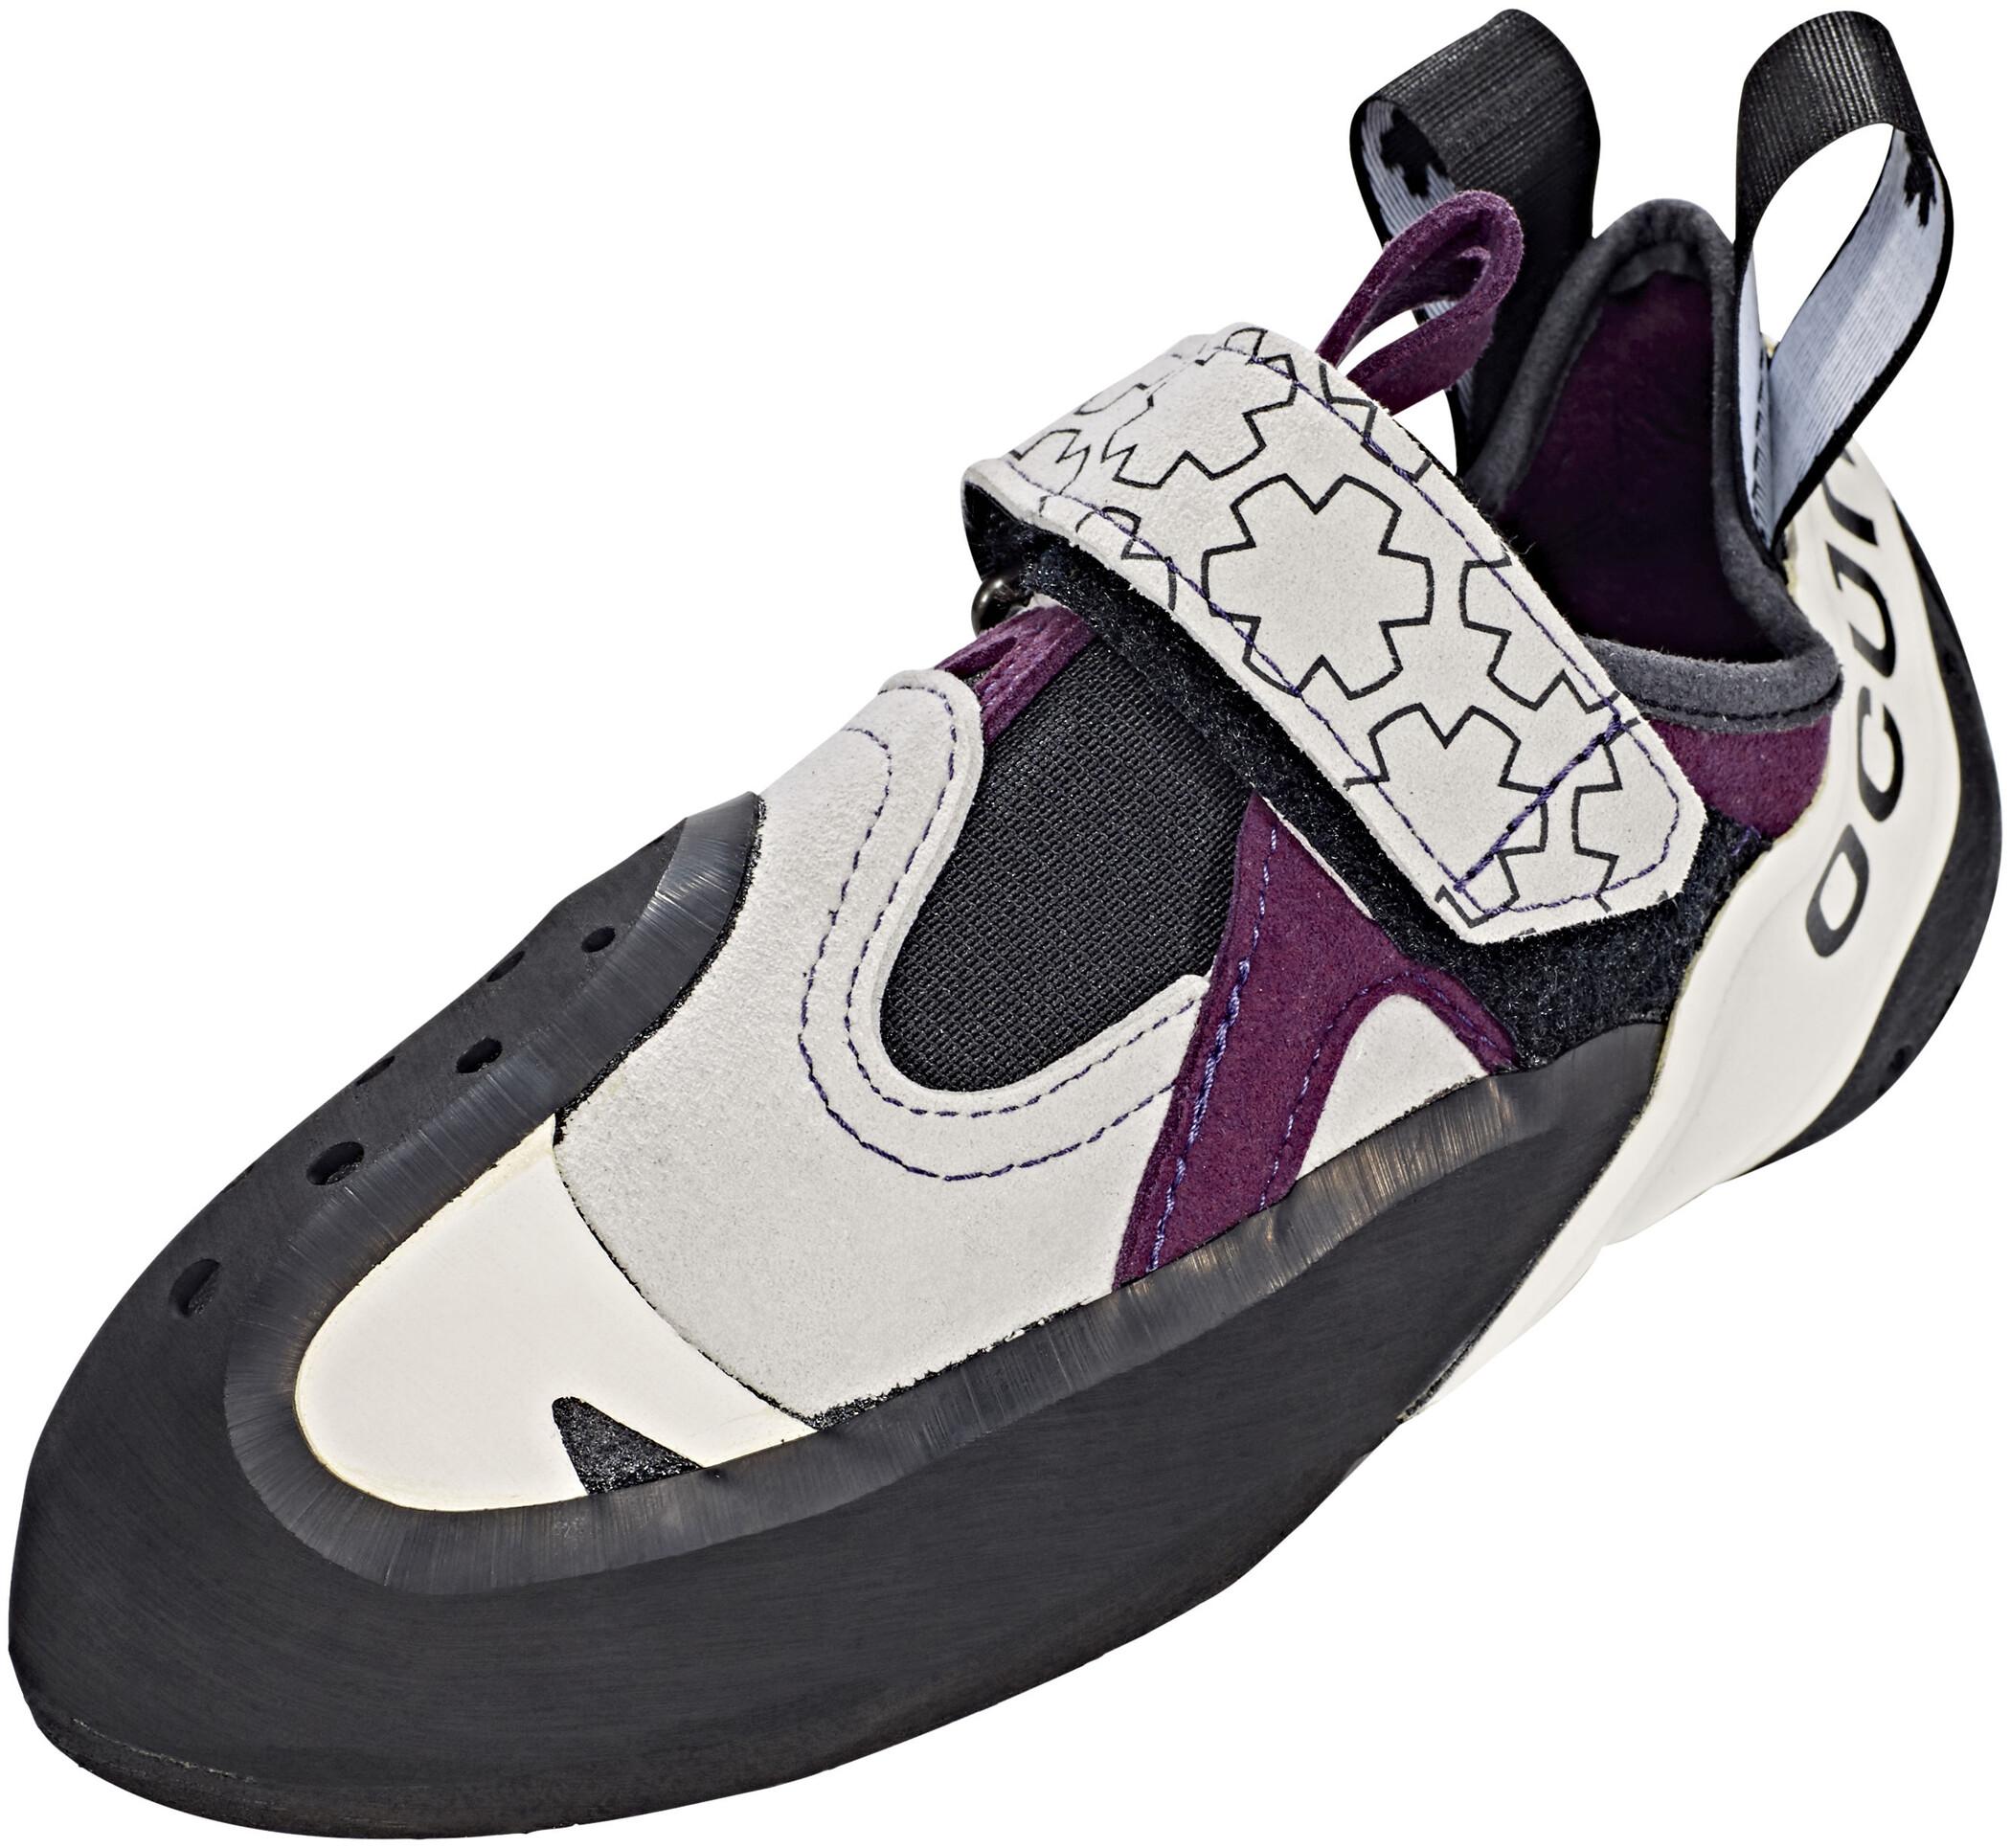 Ocun OXI Weiß-Lila/Violett, Damen Kletterschuh, Größe EU 37 - Farbe White-Purple Damen Kletterschuh, White - Purple, Größe 37 - Weiß-Lila/Violett